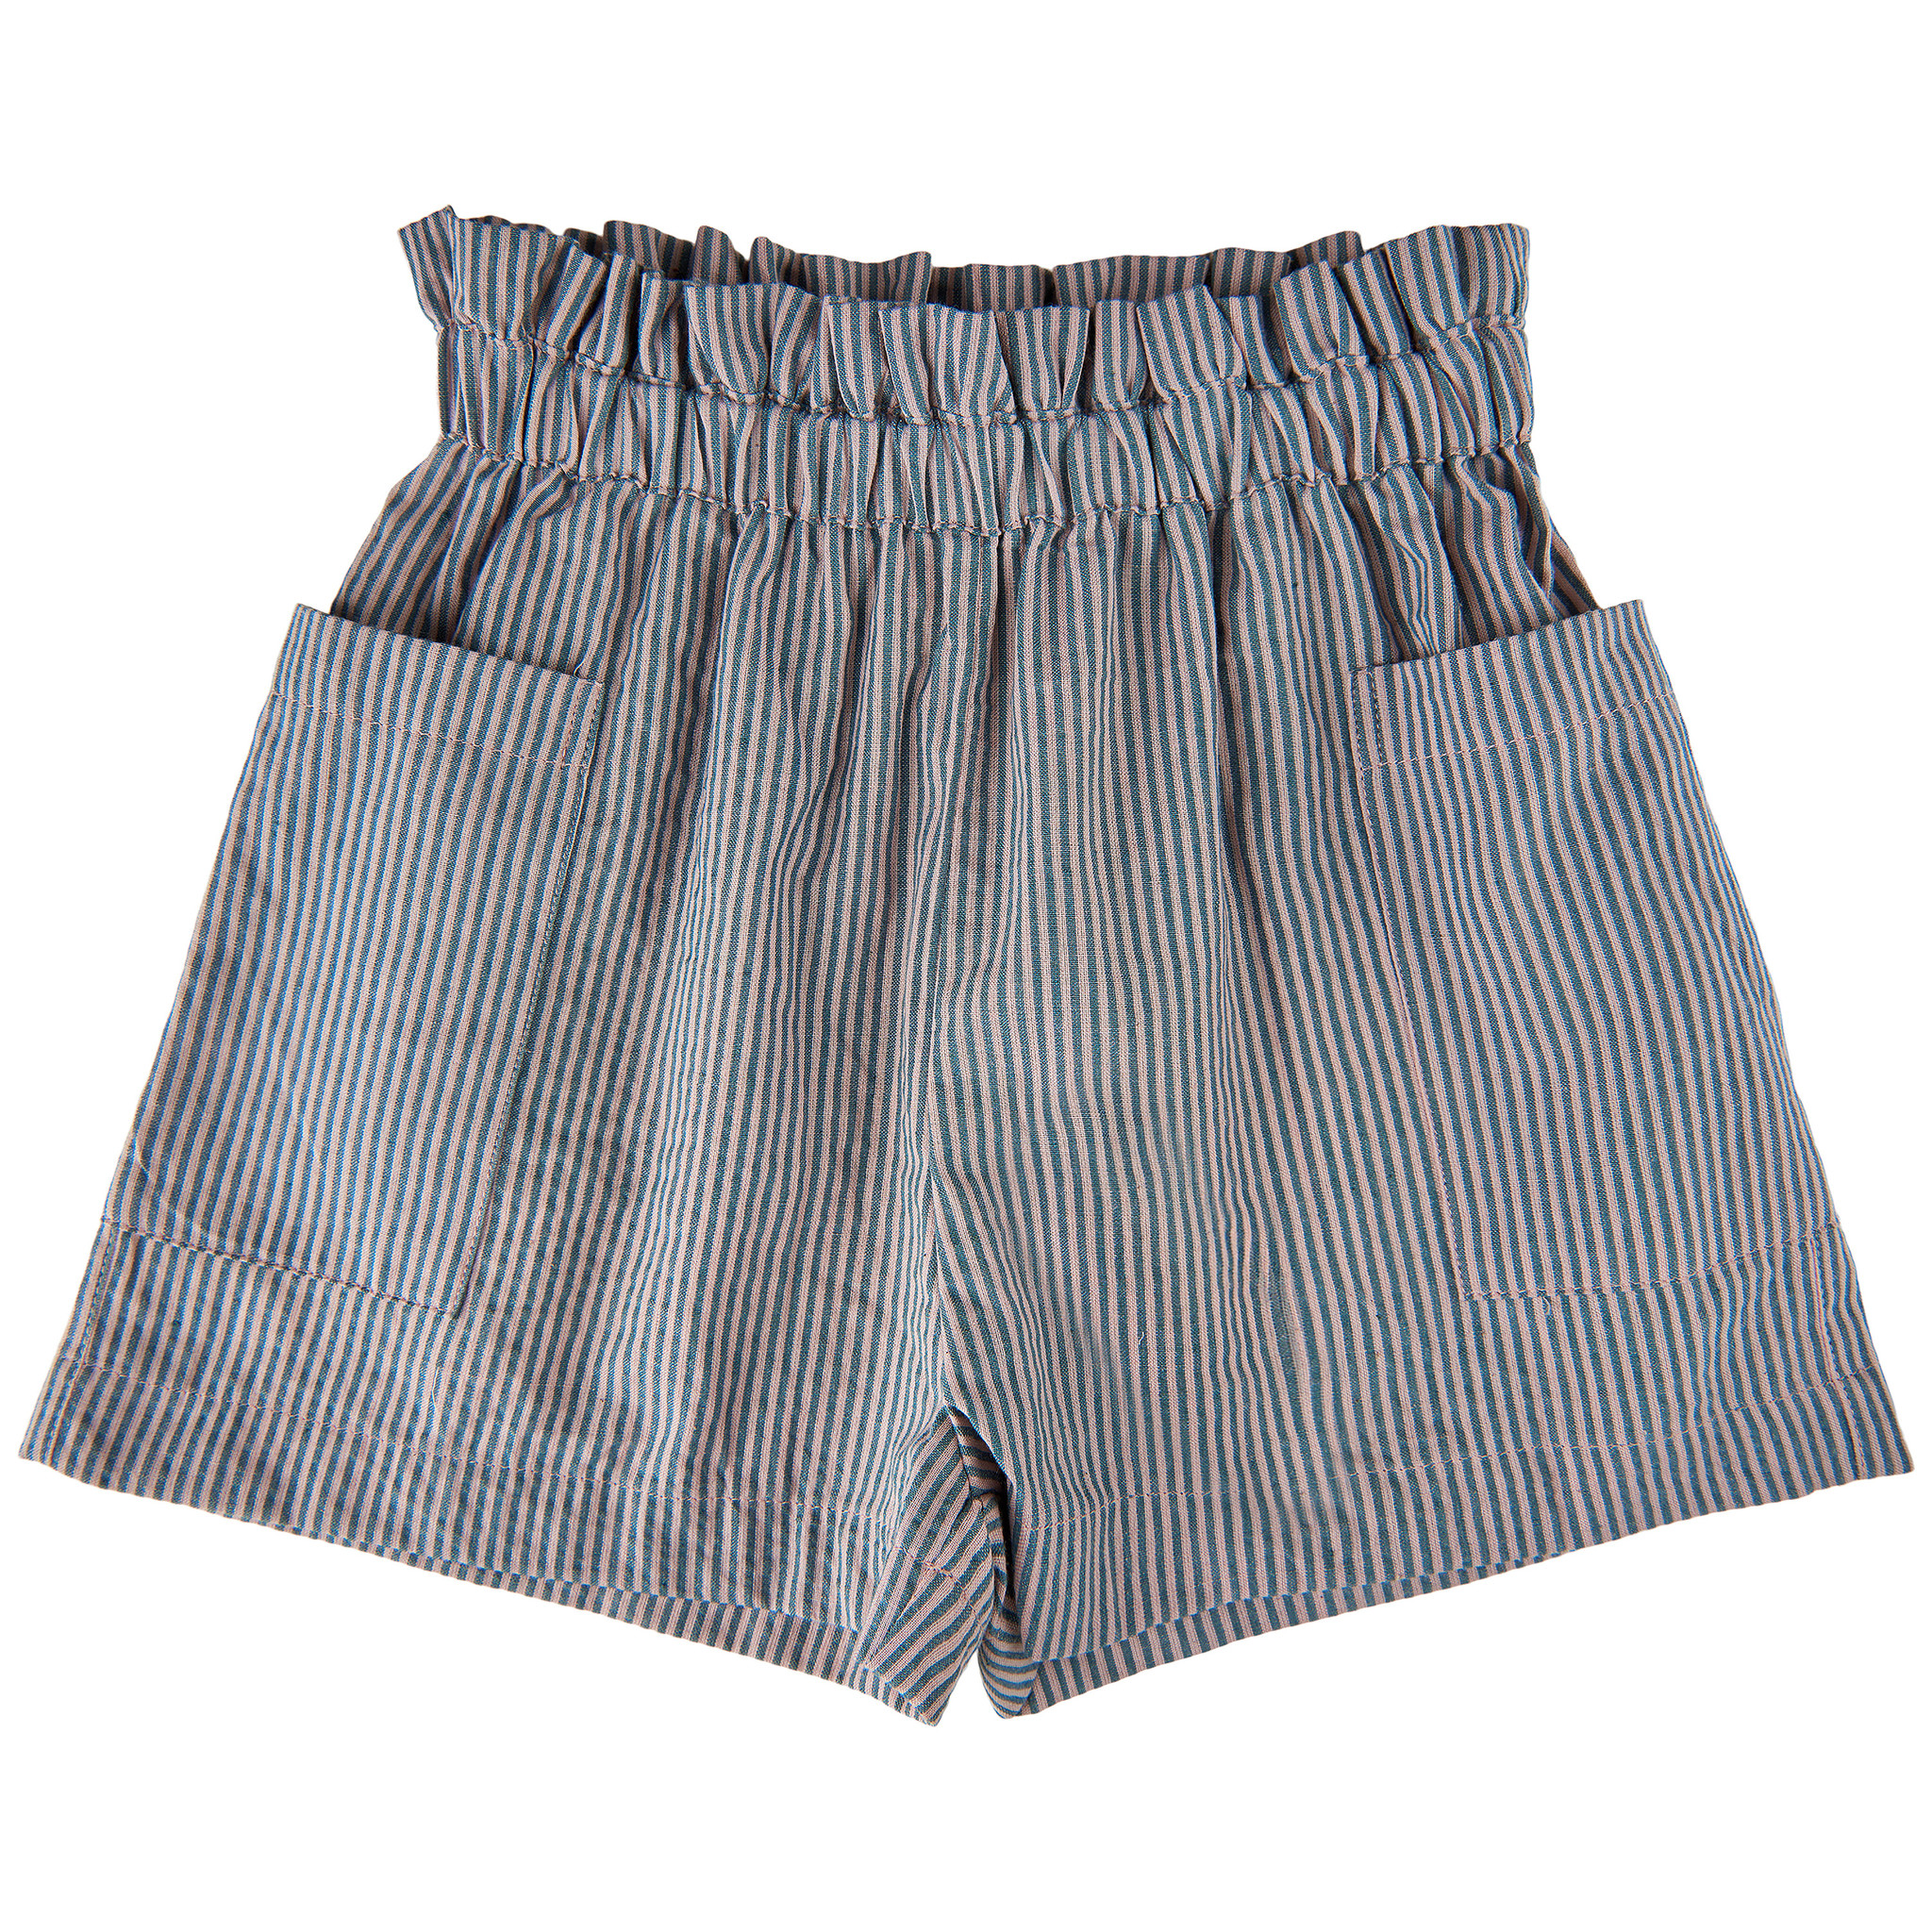 Hella shorts - Pale Mauve-1